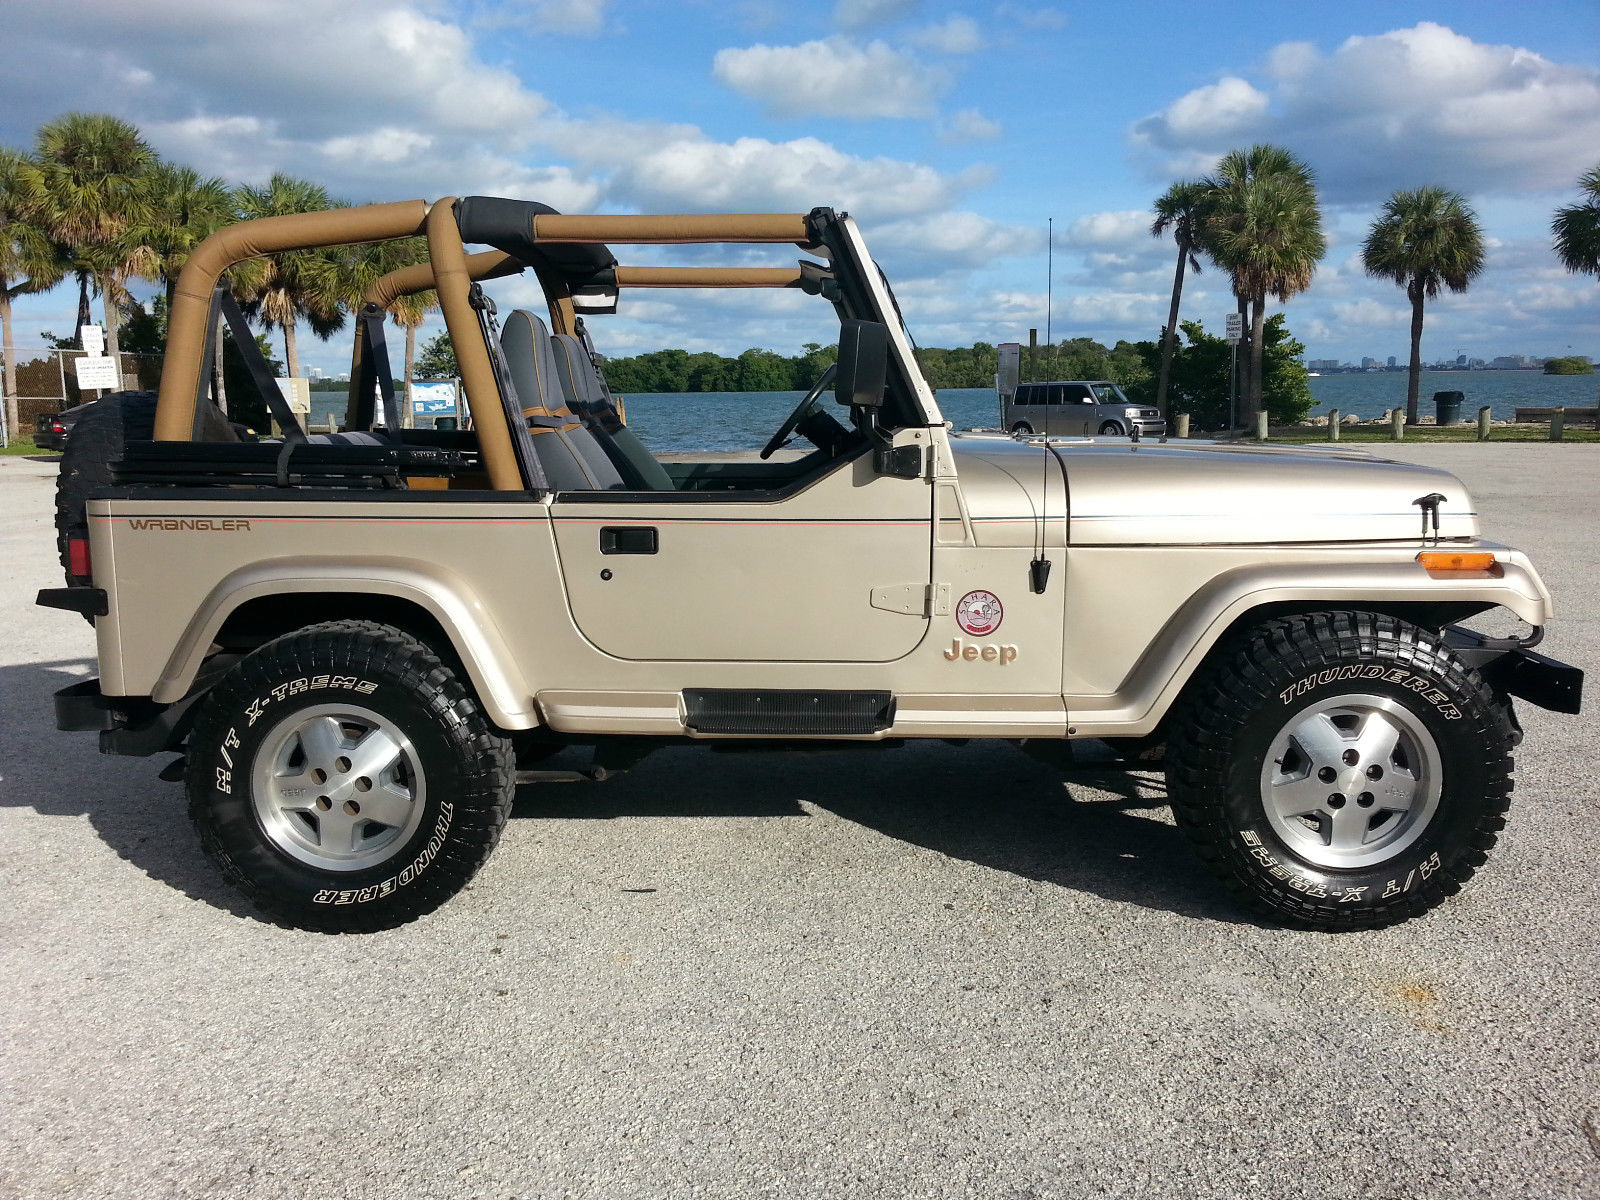 1993 jeep wrangler sahara sport utility 2 door 4 0l one owner florida jeep for sale in miami. Black Bedroom Furniture Sets. Home Design Ideas